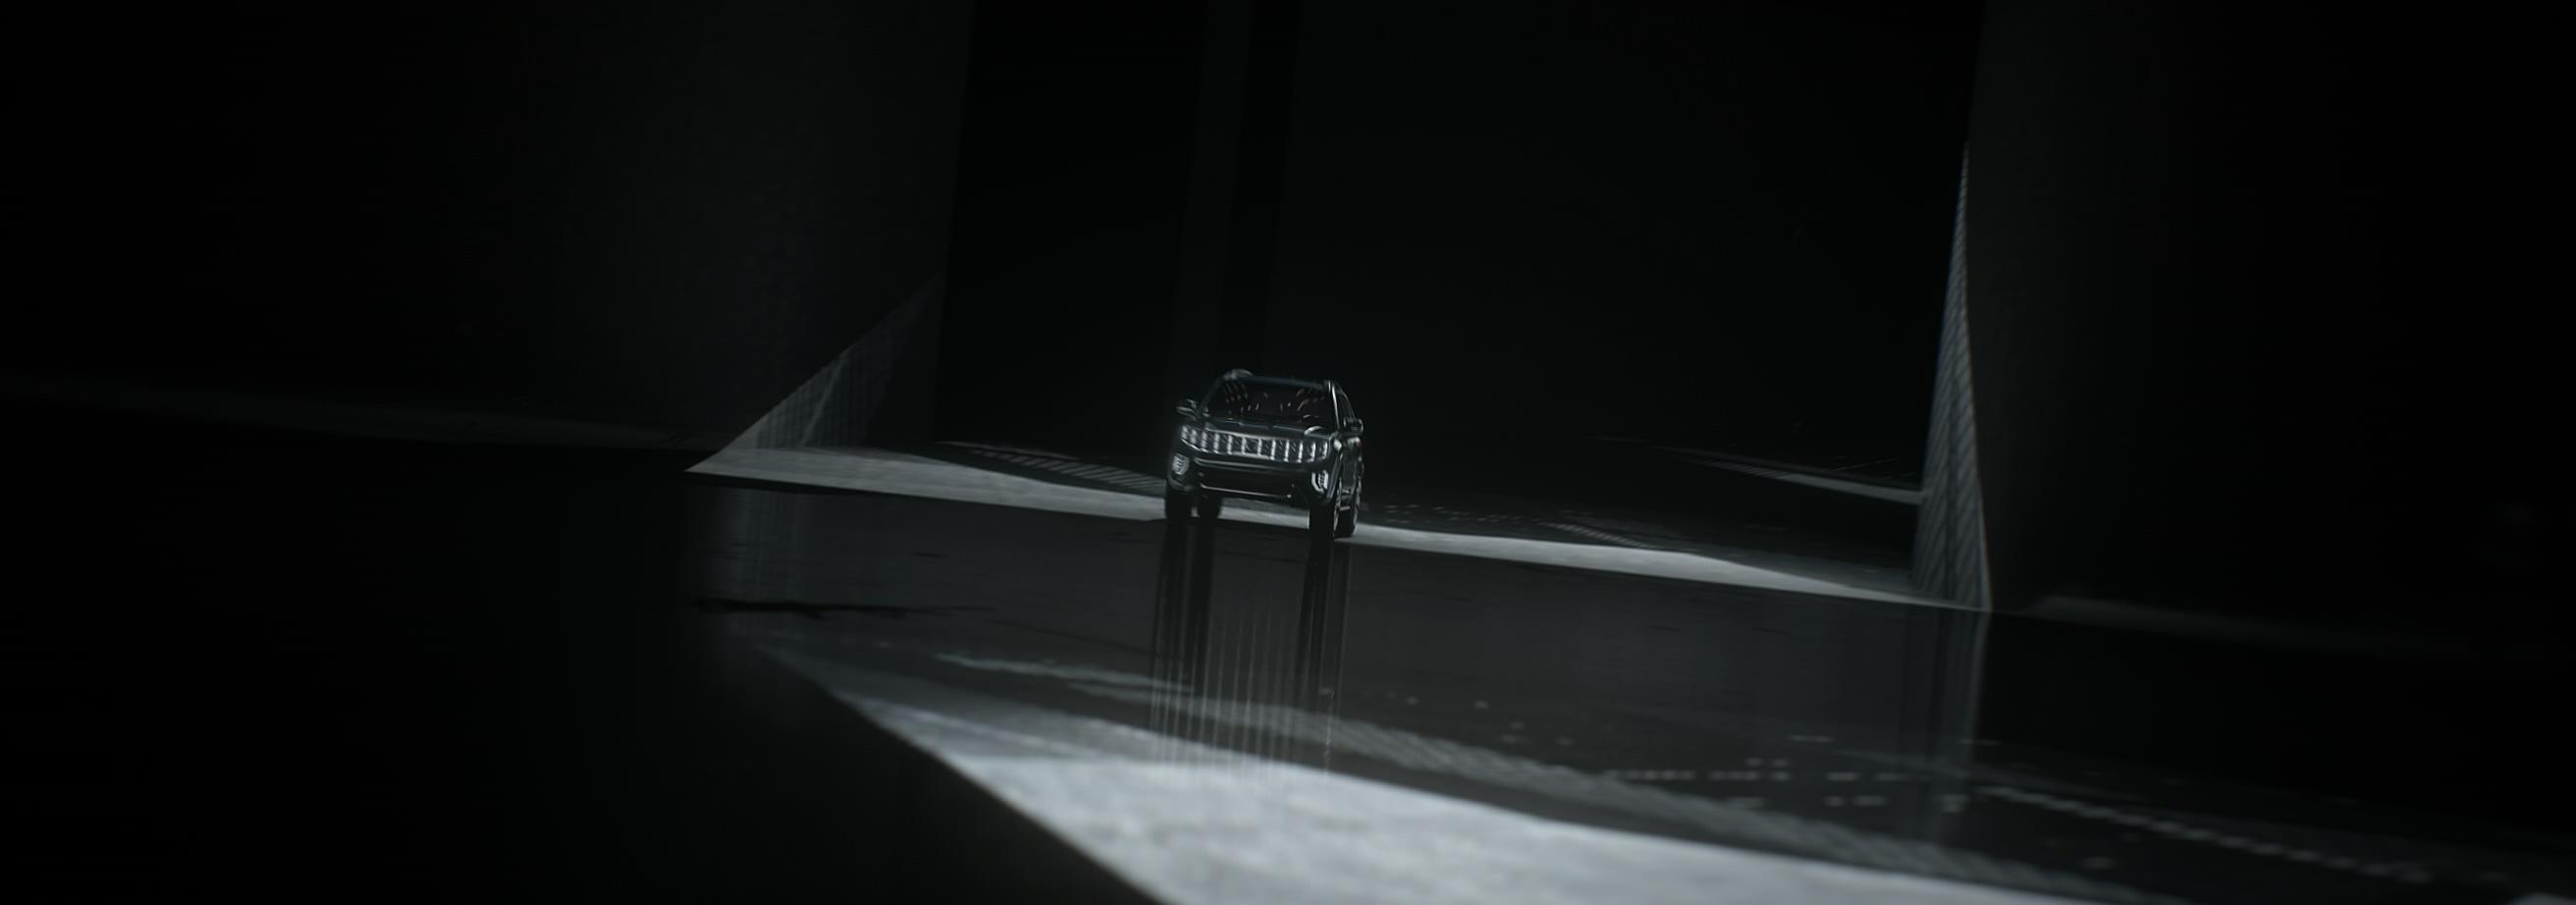 Kia_Motorshow-Director_render.mov_20190416_145316.288.jpg